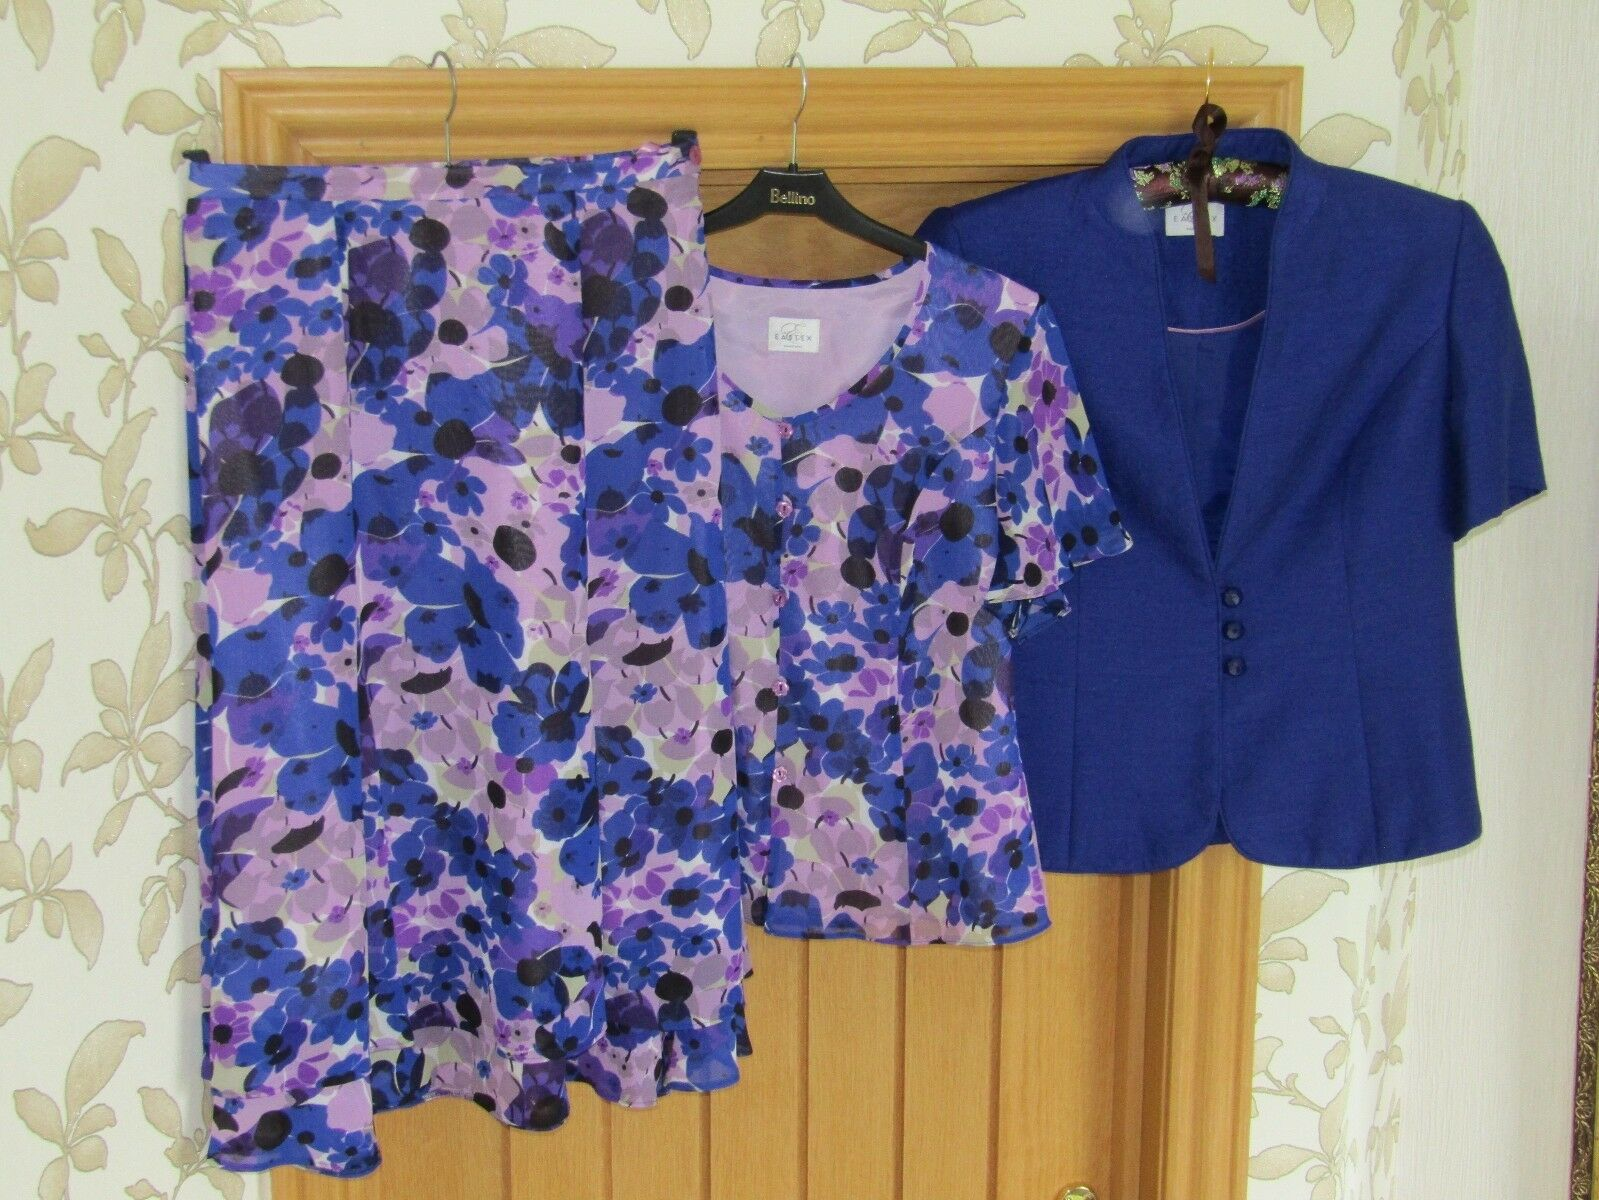 Eastex blue/purple pink floral blouse skirt jacket suit uk 10 wedding cruise exc